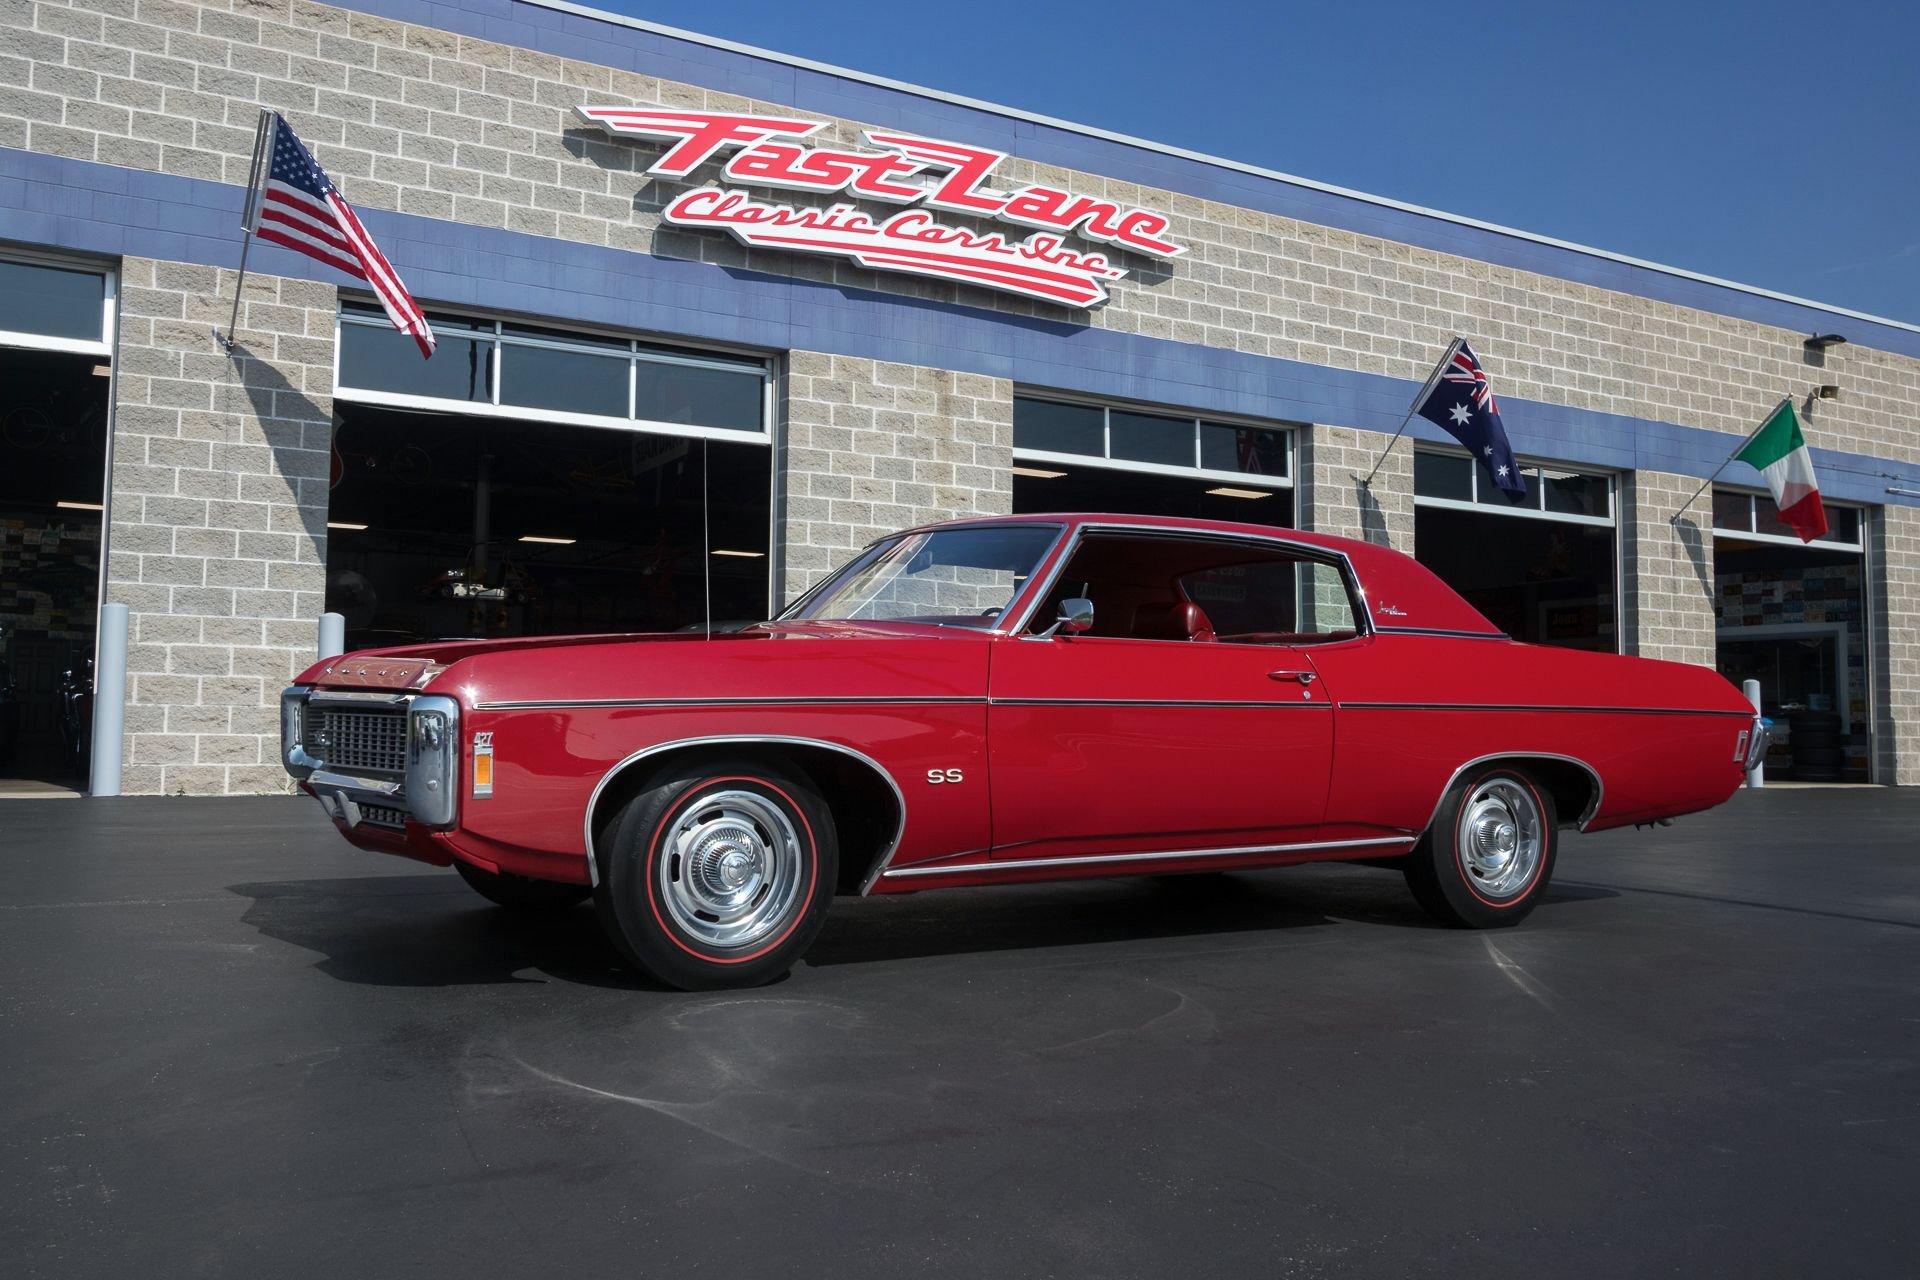 1969 chevrolet impala ss427